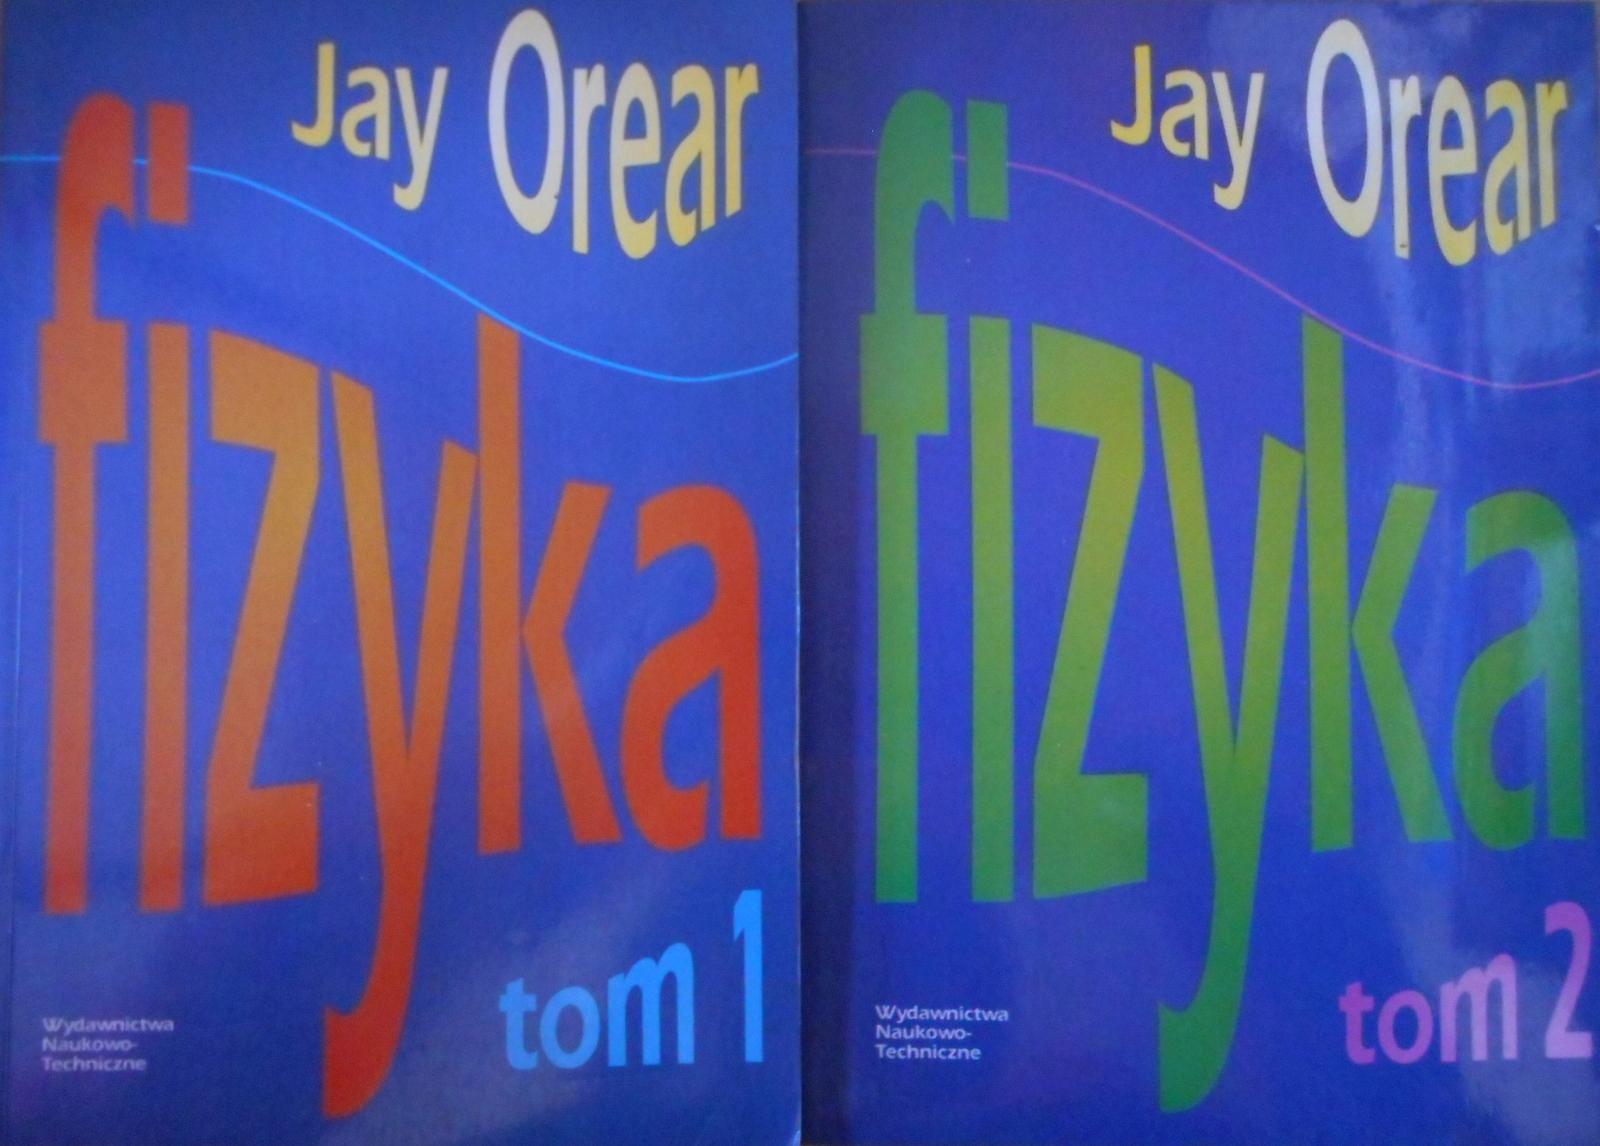 Fizyka tom 1 i 2 komplet Jay Orear